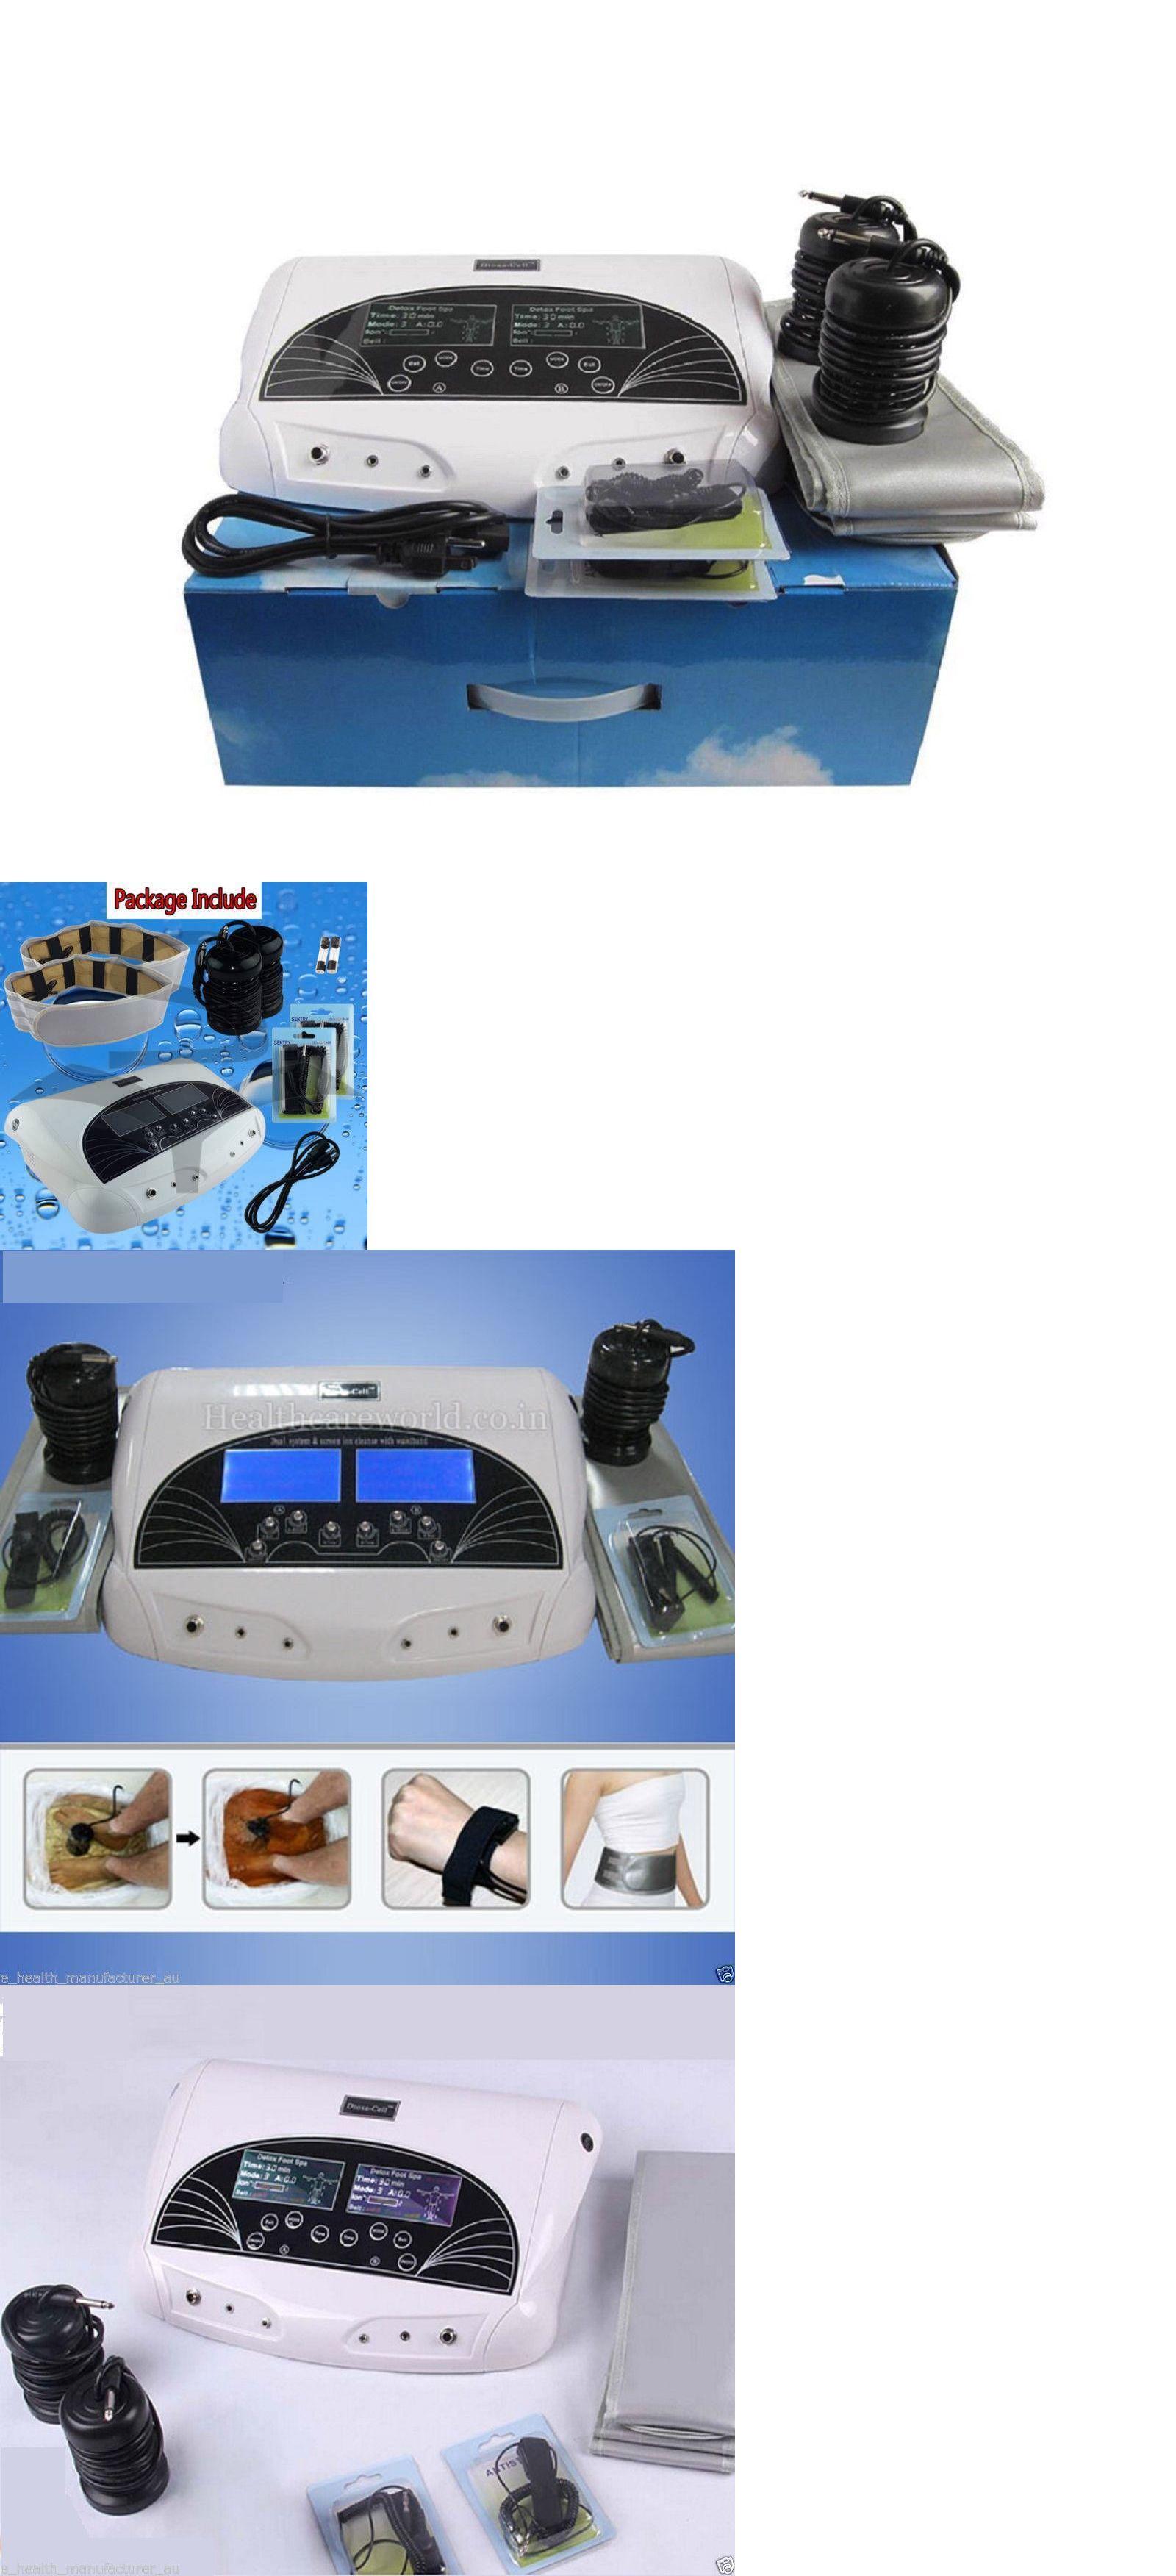 Enchanting Buy Baths Component - Bathtub Design Ideas - klotsnet.com